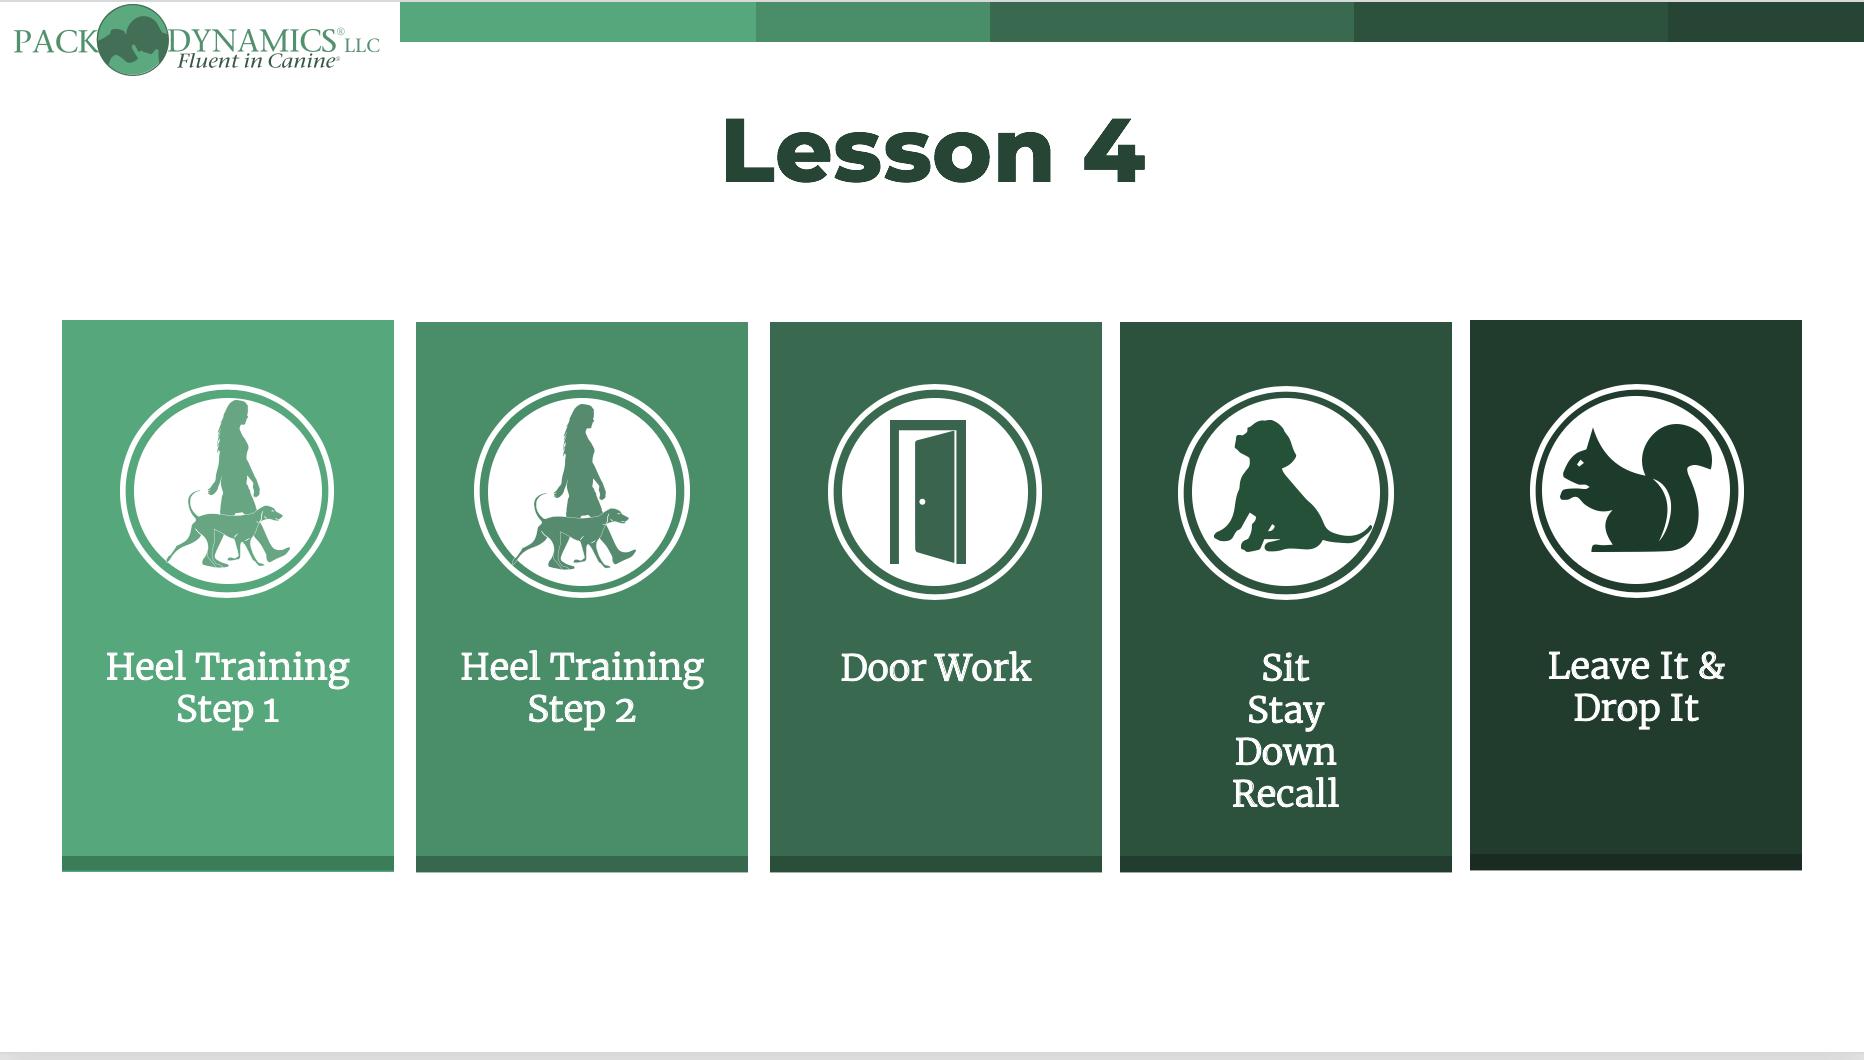 Pack Dynamics - Online Course - Lesson 4